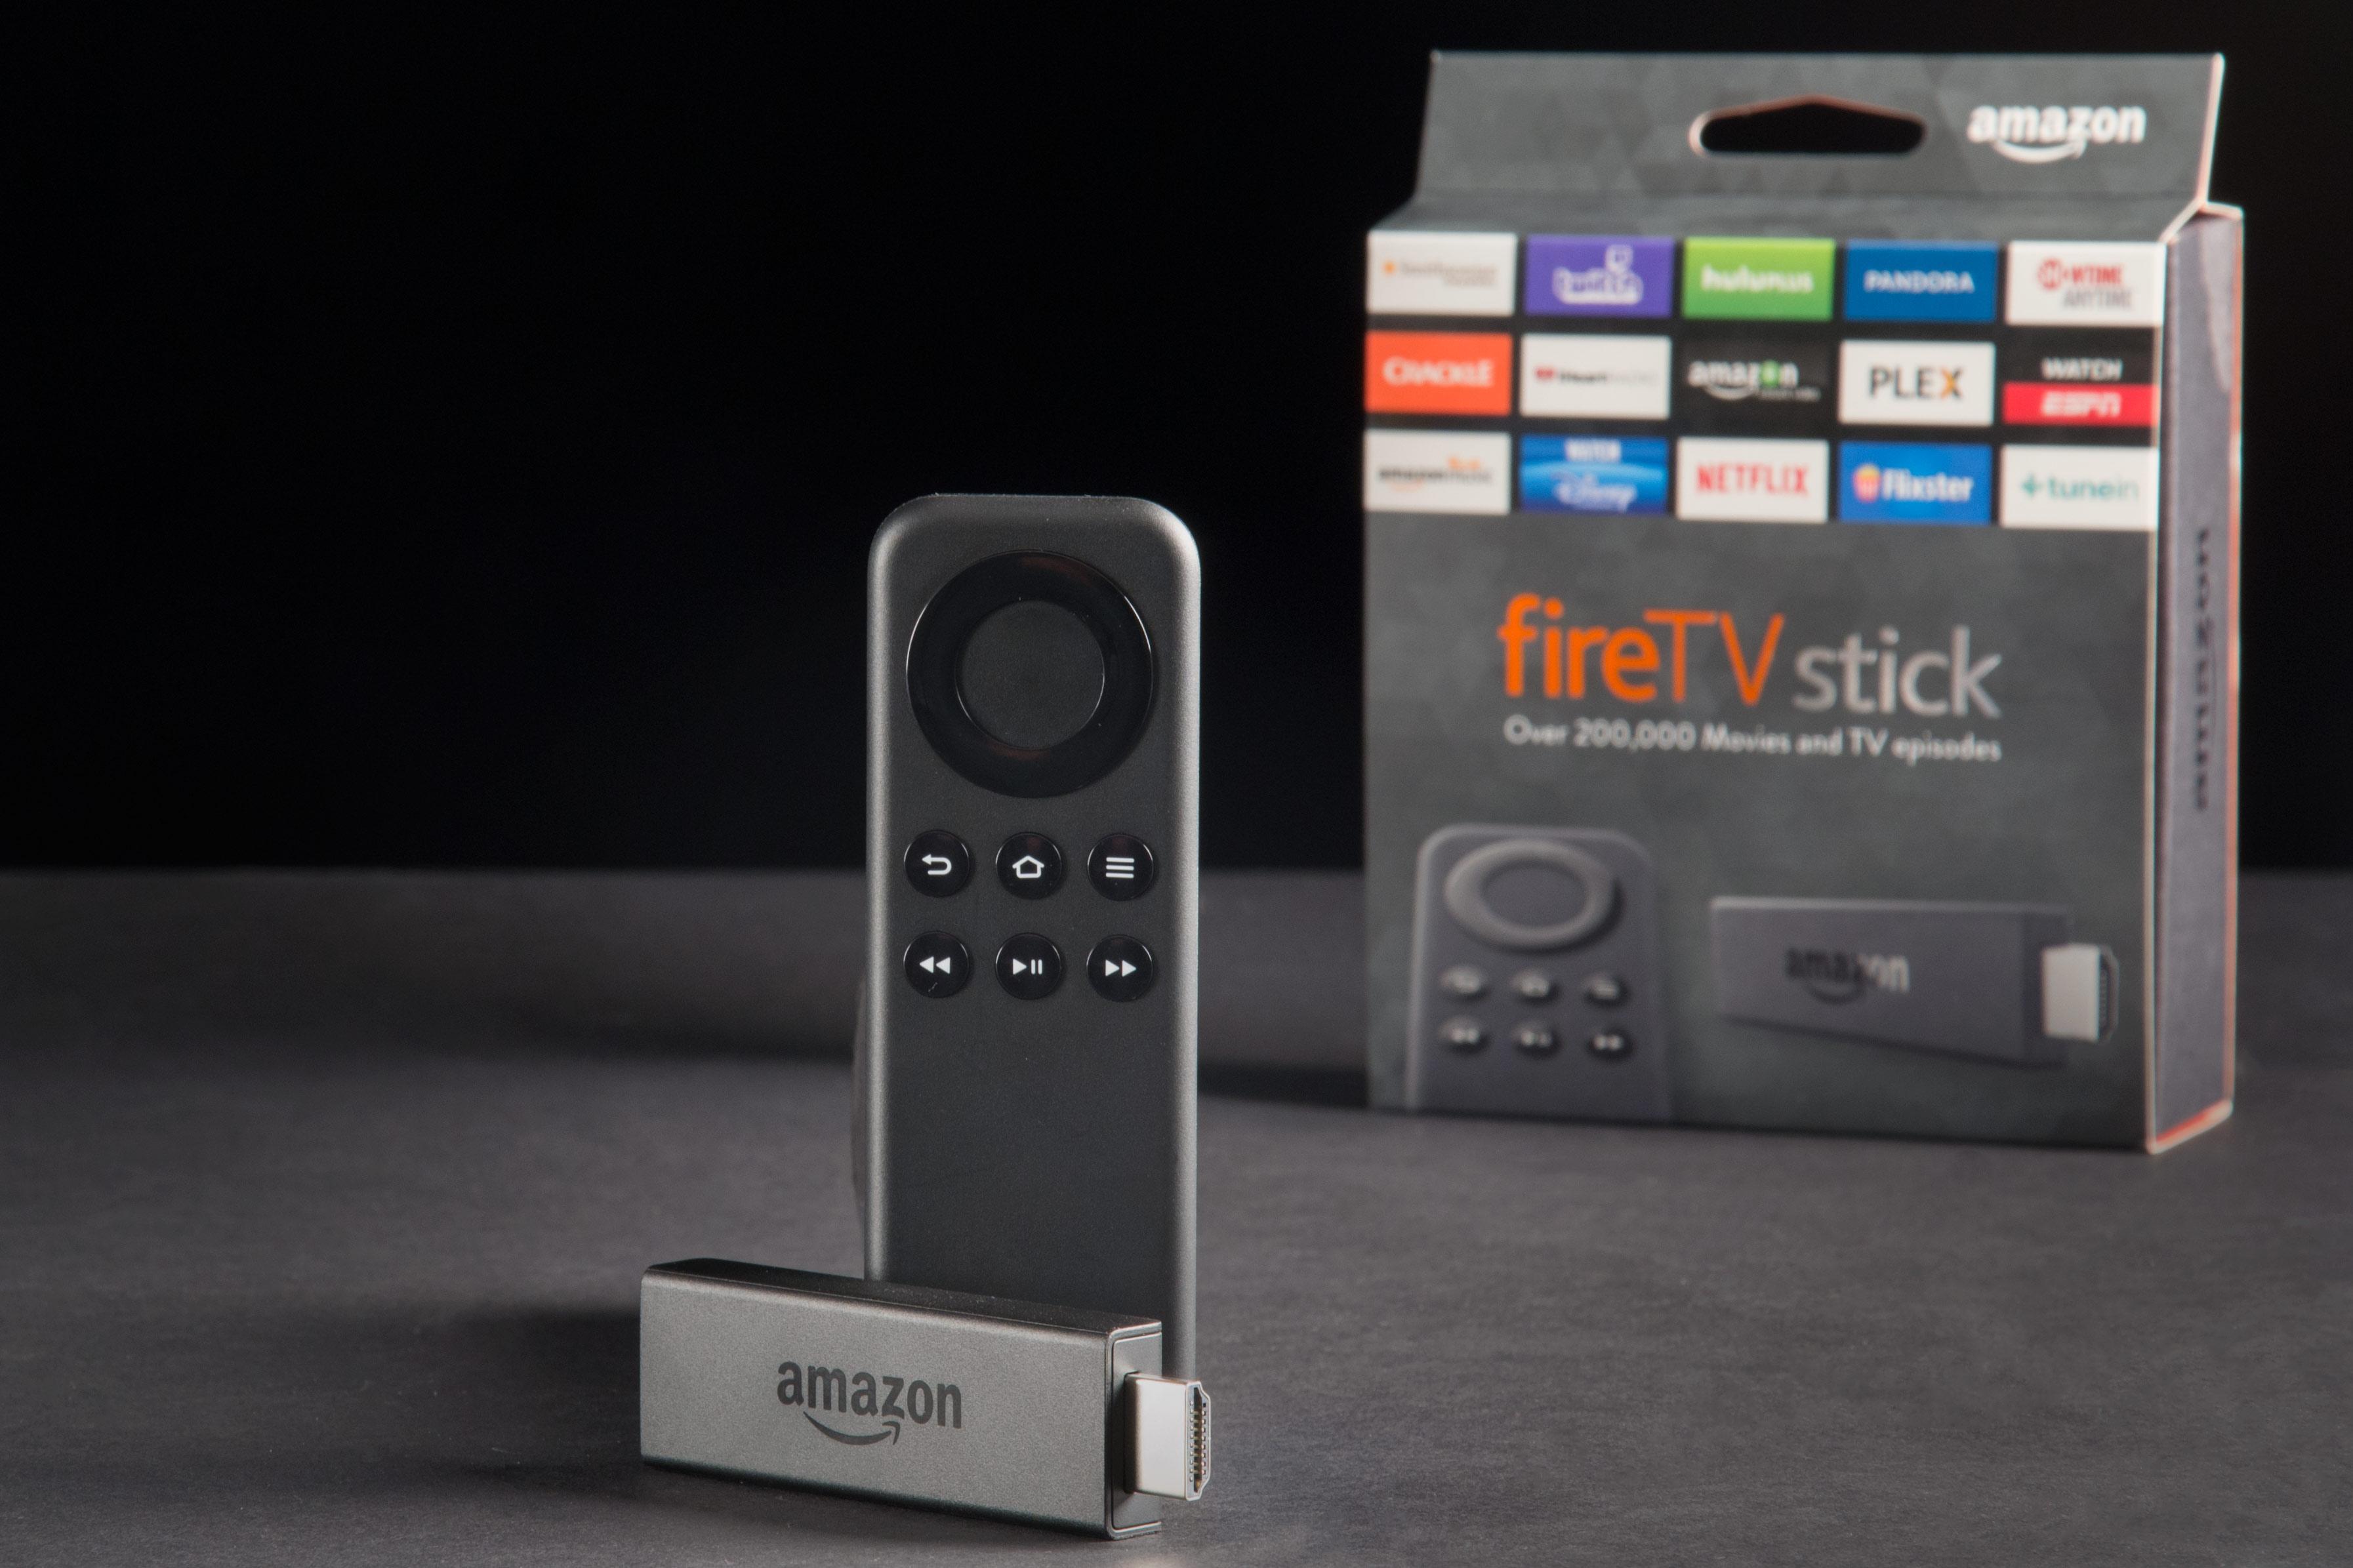 Amazon Stick